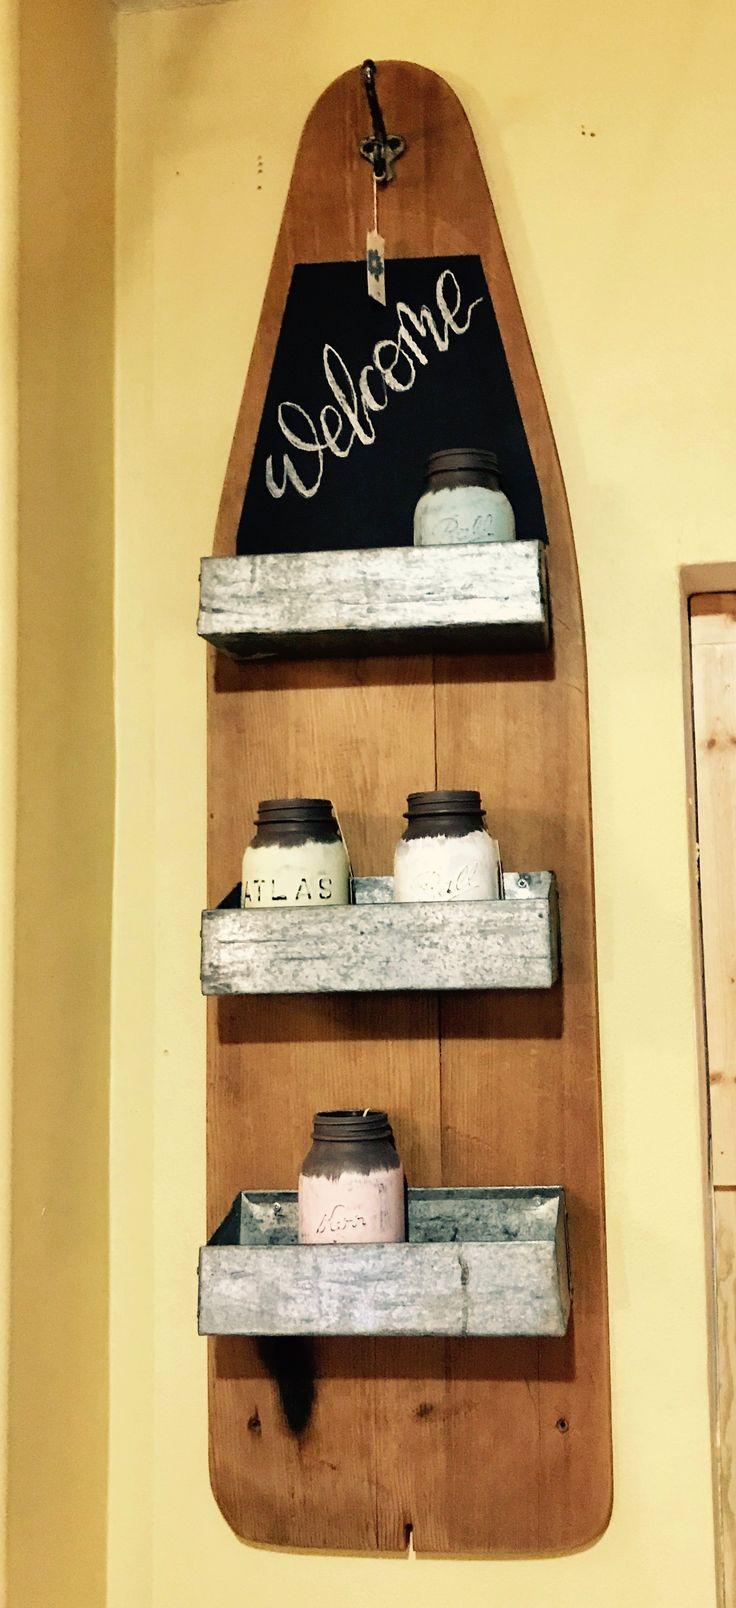 Best 25+ Ironing board storage ideas on Pinterest | Laundry closet organization, Laundry rooms ...